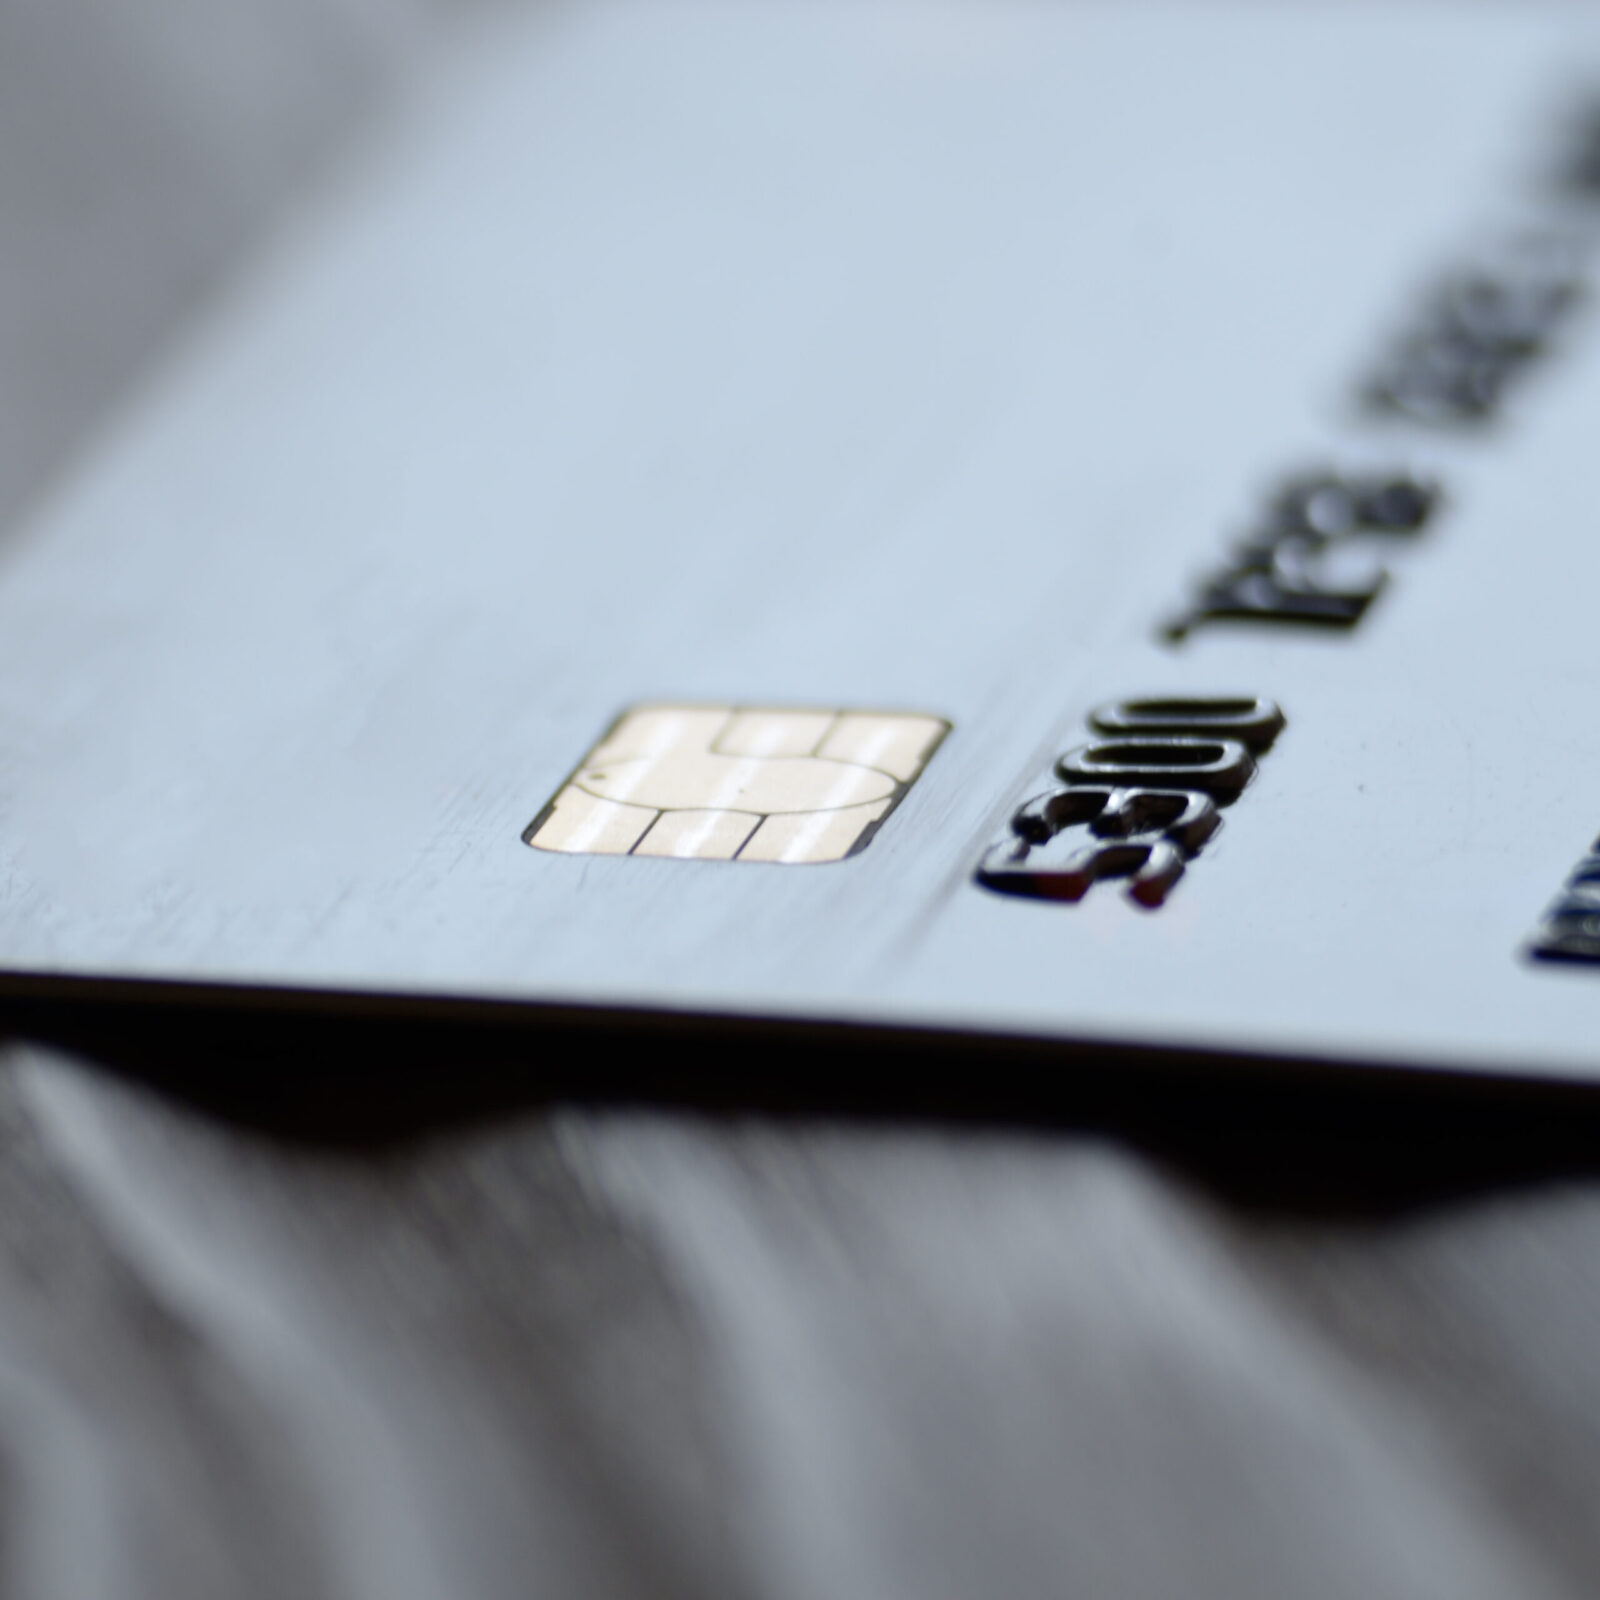 Macro photo of credit or debit card